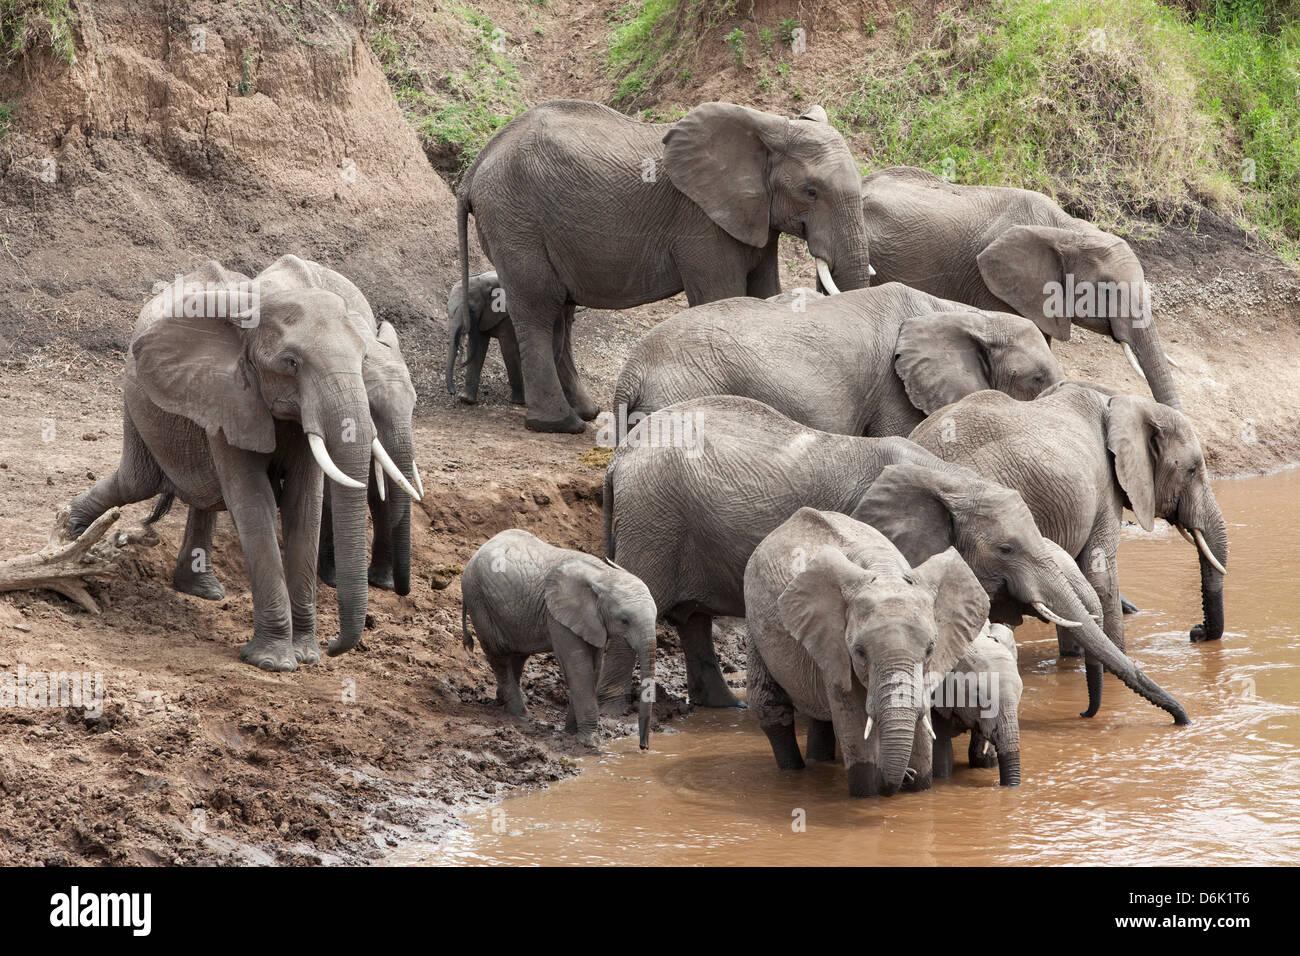 Elephants (Loxodonta africana) at Mara River, Masai Mara National Reserve, Kenya, East Africa, Africa Stock Photo